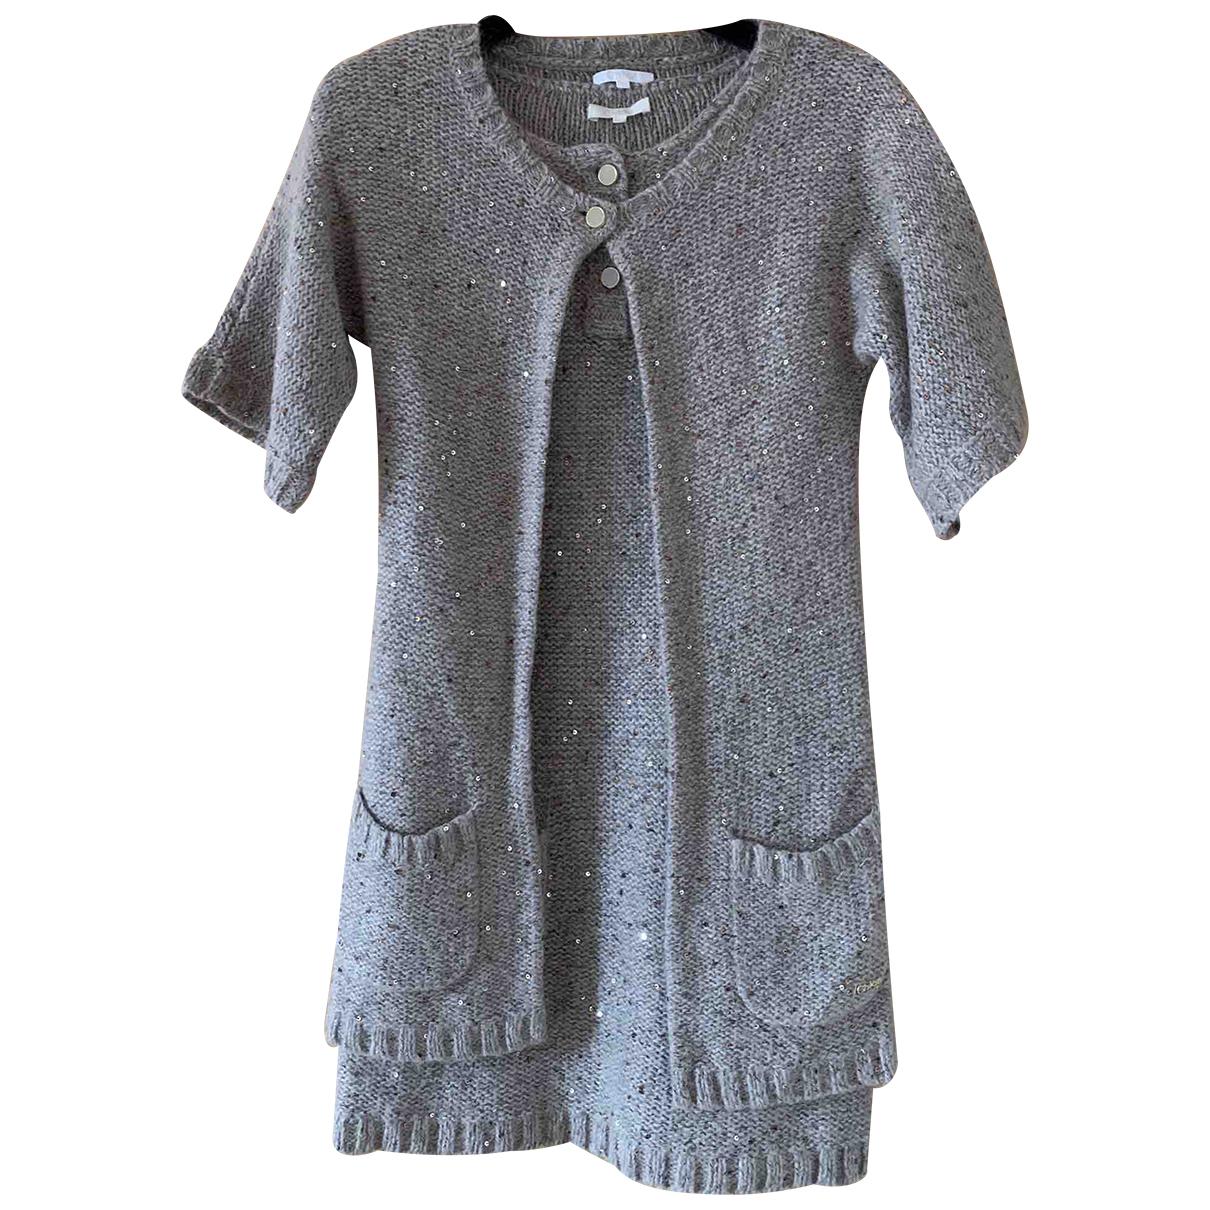 Chloé N Beige Wool dress for Kids 10 years - up to 142cm FR